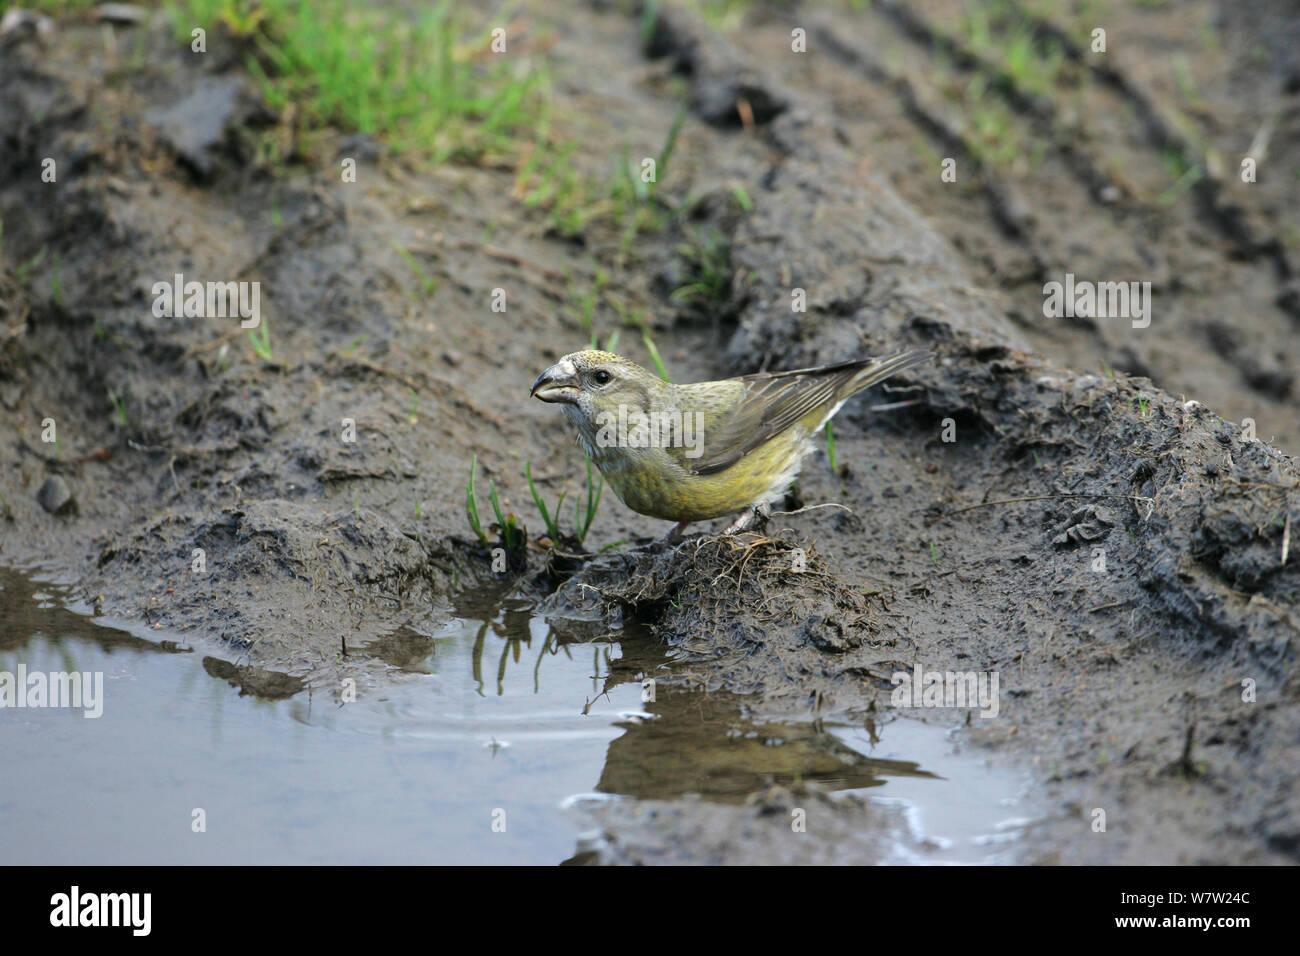 Common crossbill (Loxia curvirostra) female drinking from muddy puddle. Glen Feshie Highland Region, Scotland, UK, May. Stock Photo